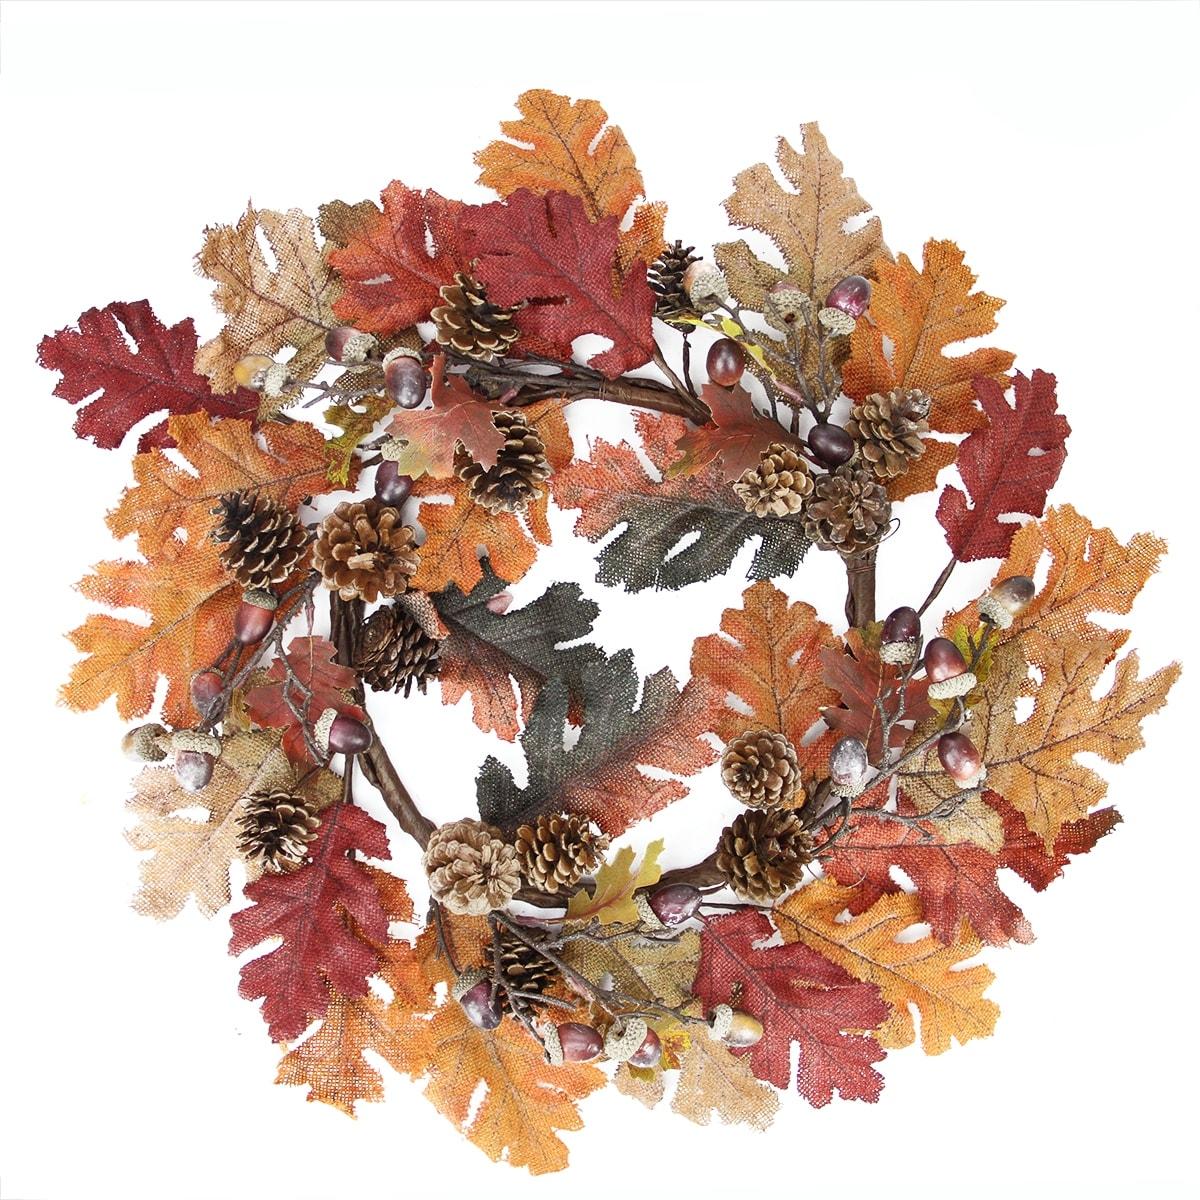 22 Autumn Harvest Burlap Leaf, Acorn and Pine Cone Thanksgiving Wreath - Unlit - N/A